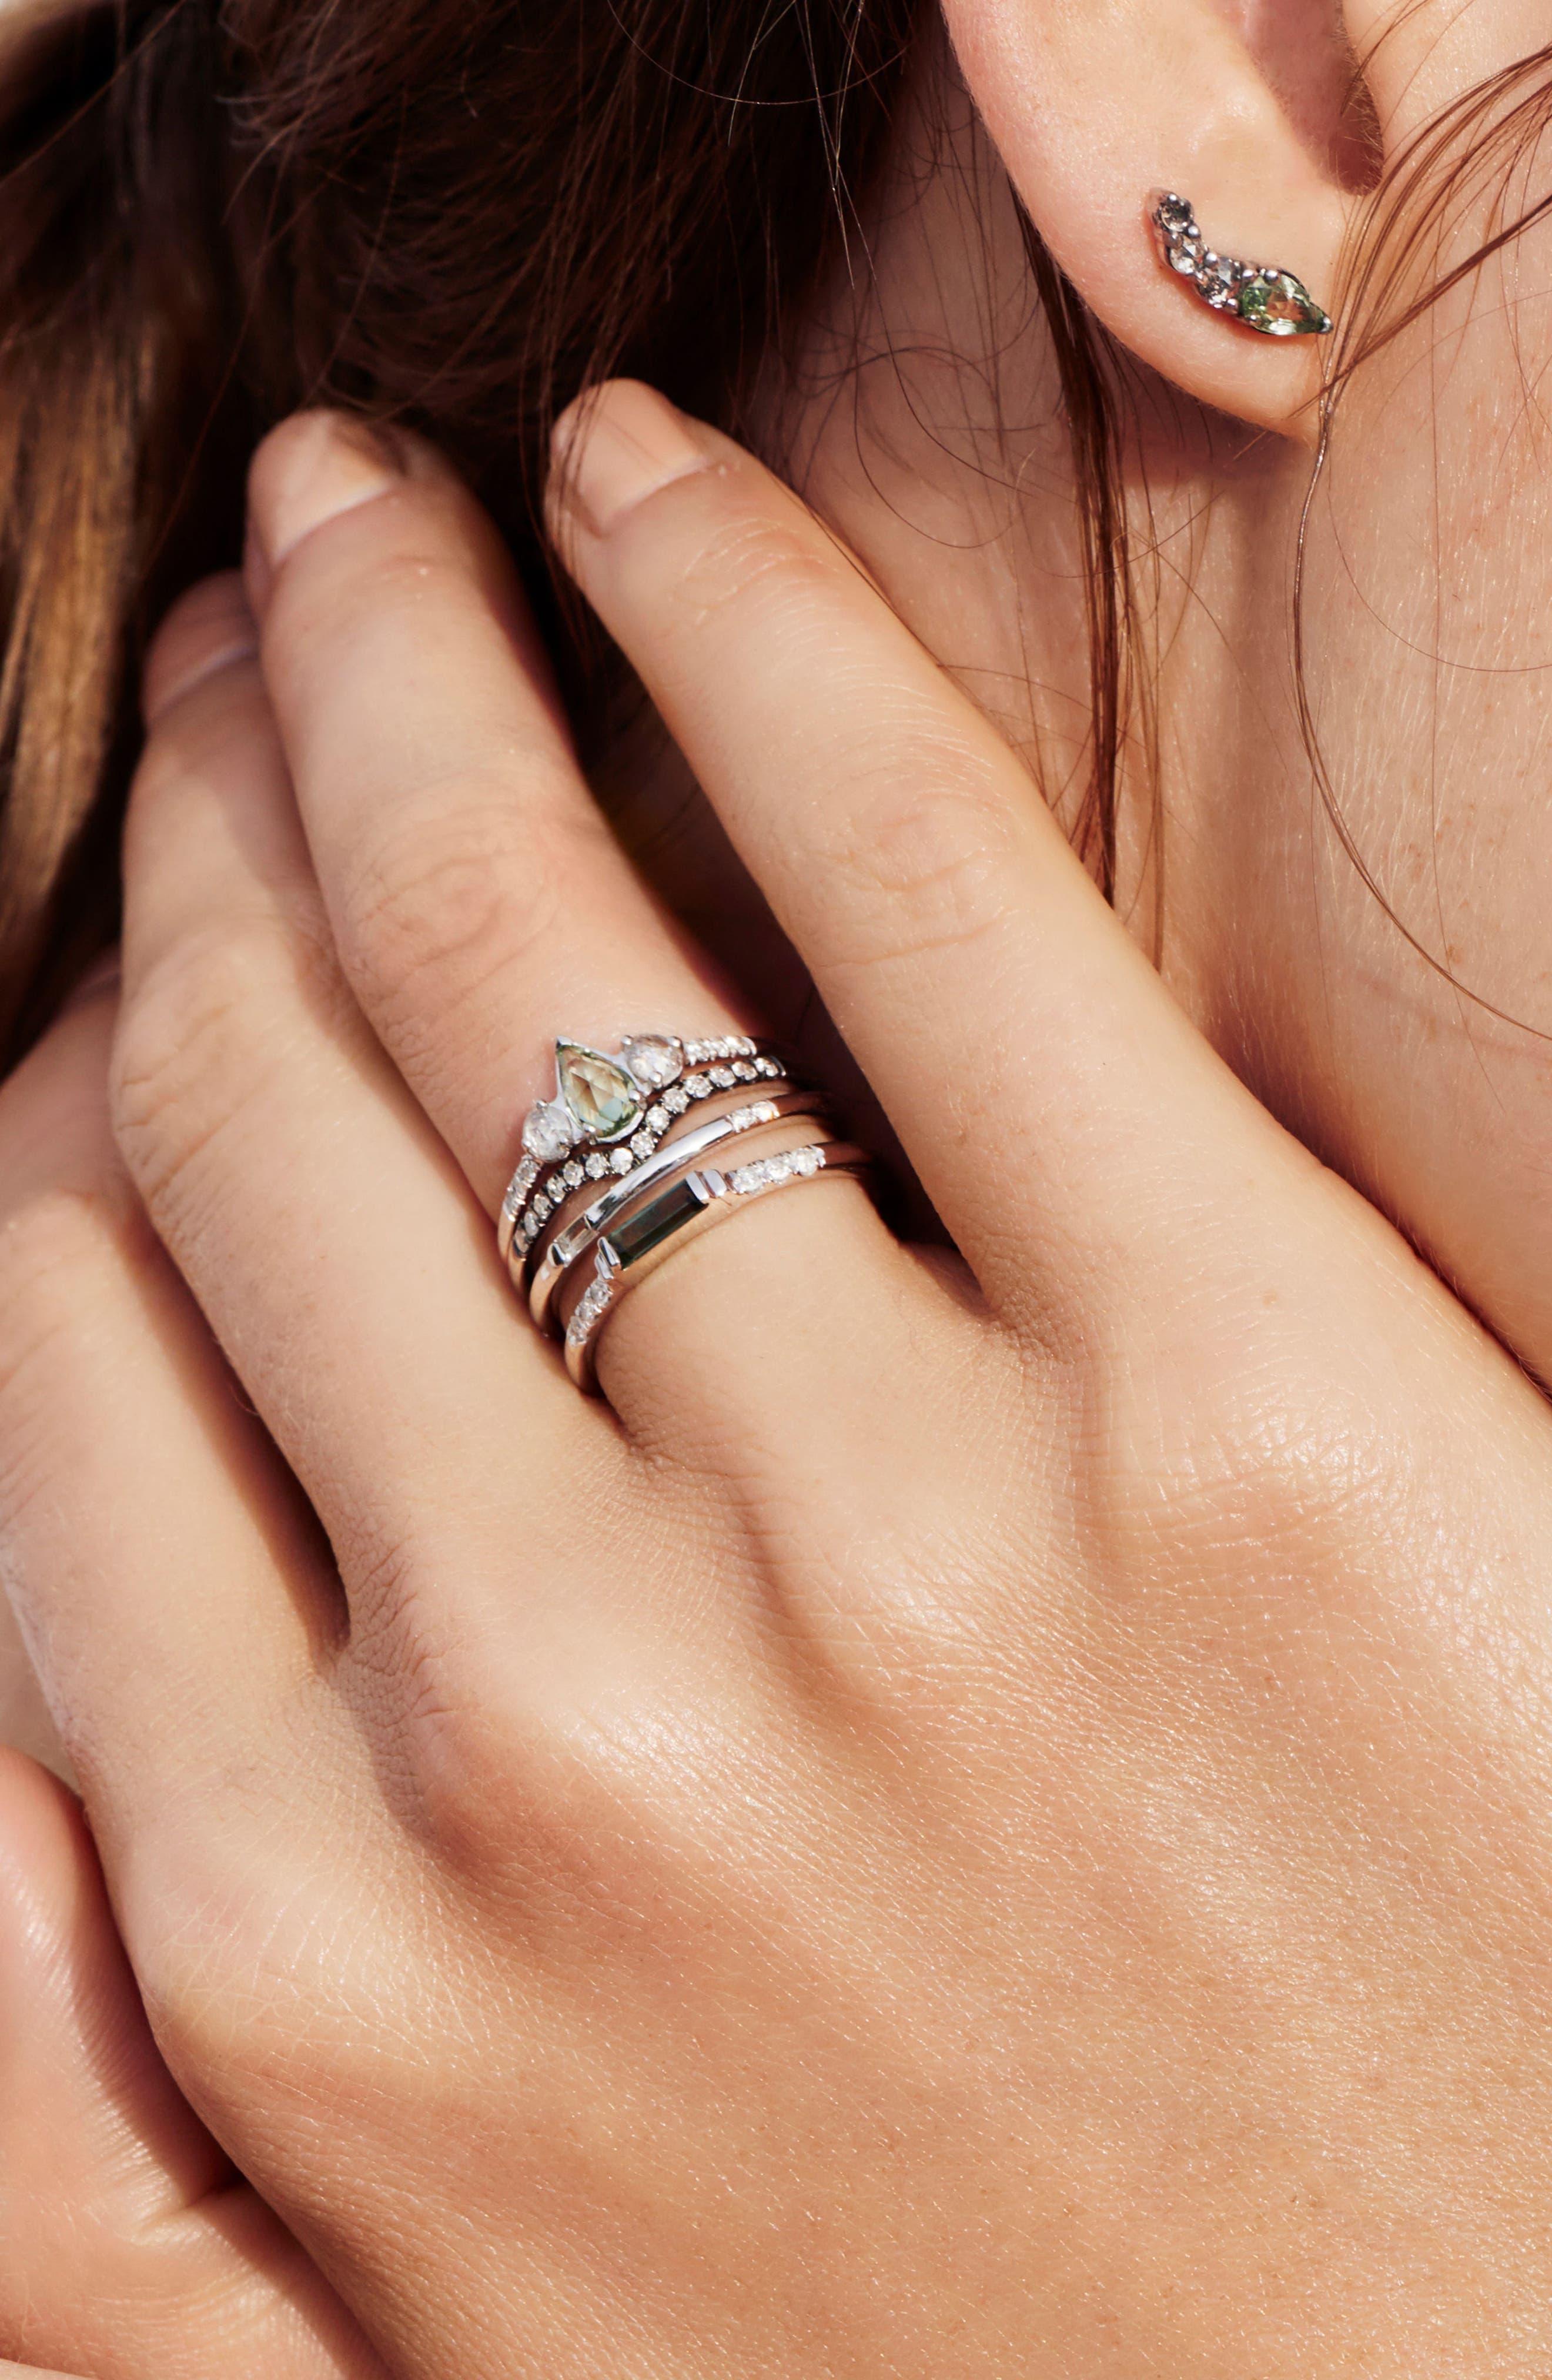 Radiance Opal & Diamond Ring,                             Alternate thumbnail 5, color,                             WHITE GOLD/ OPAL